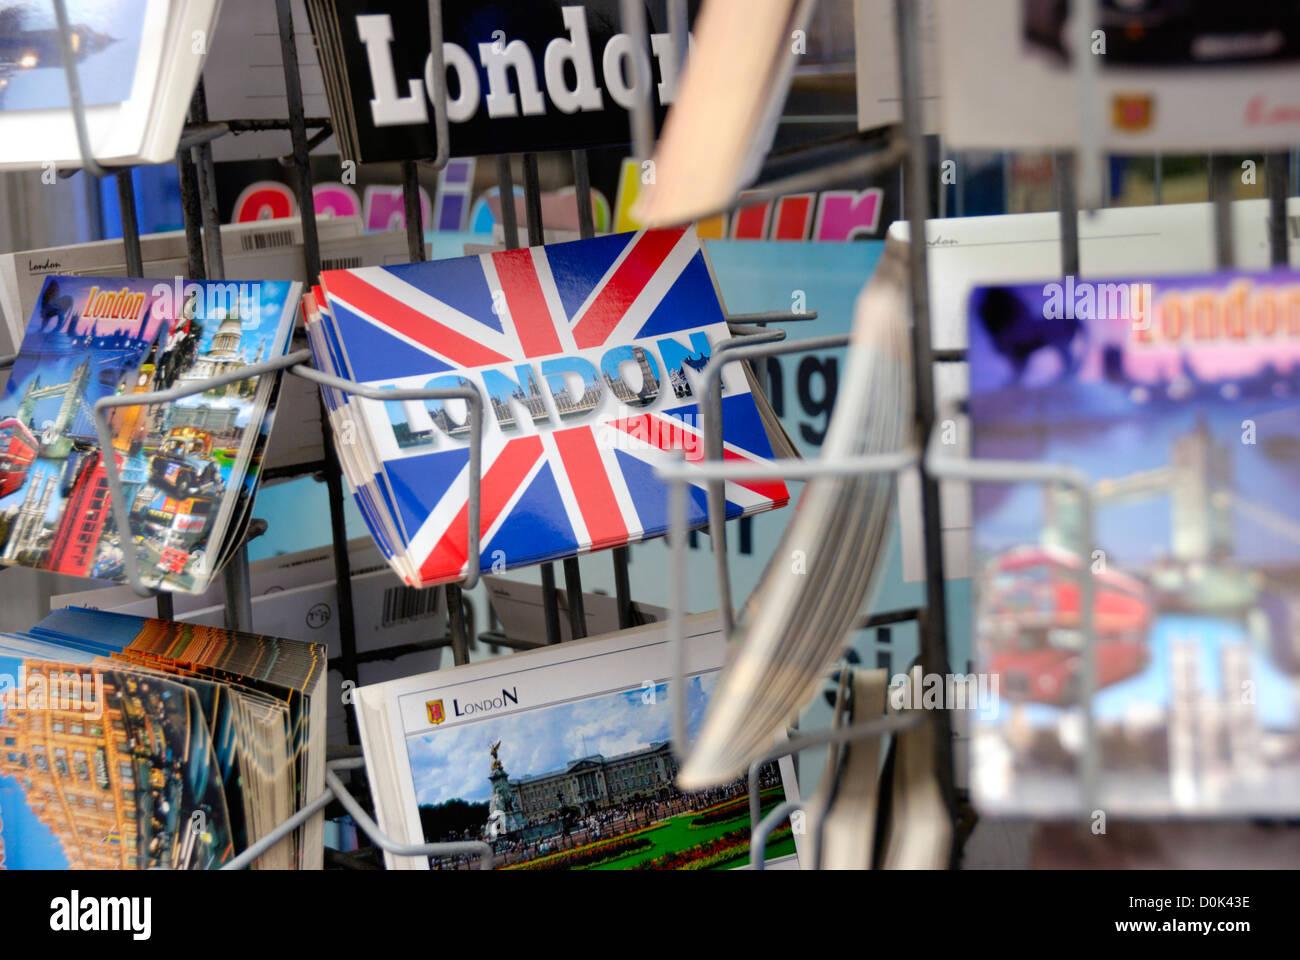 Postcards of London - Stock Image